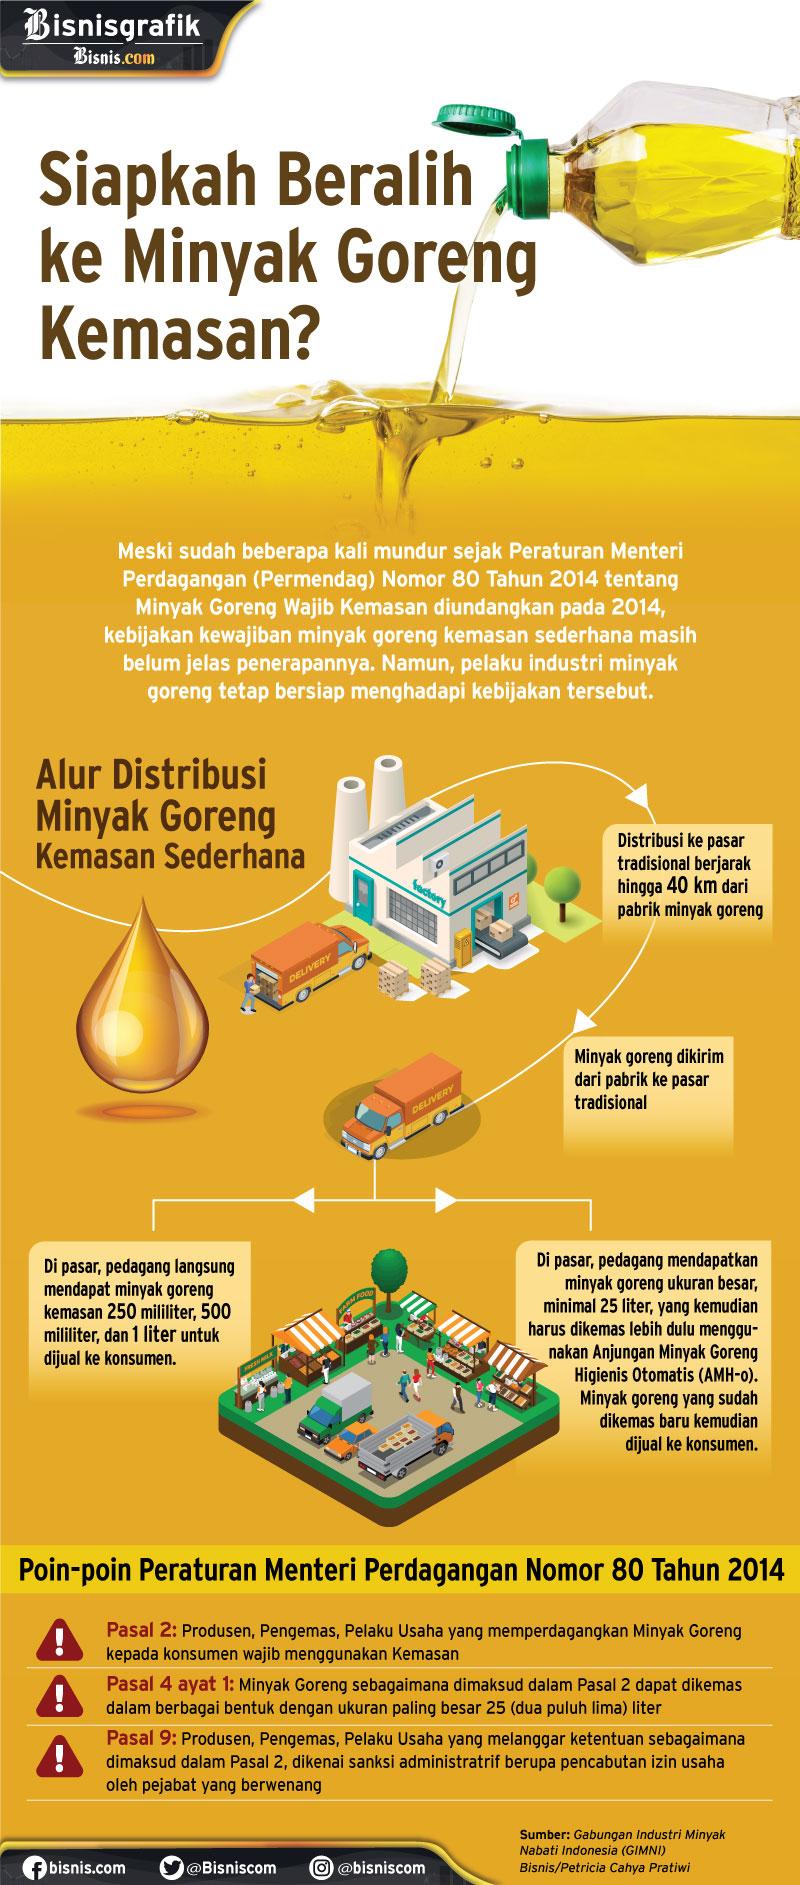 14 Okt/Bisnisgrafik/Minyak Goreng - Petricia Cahya Pratiwi